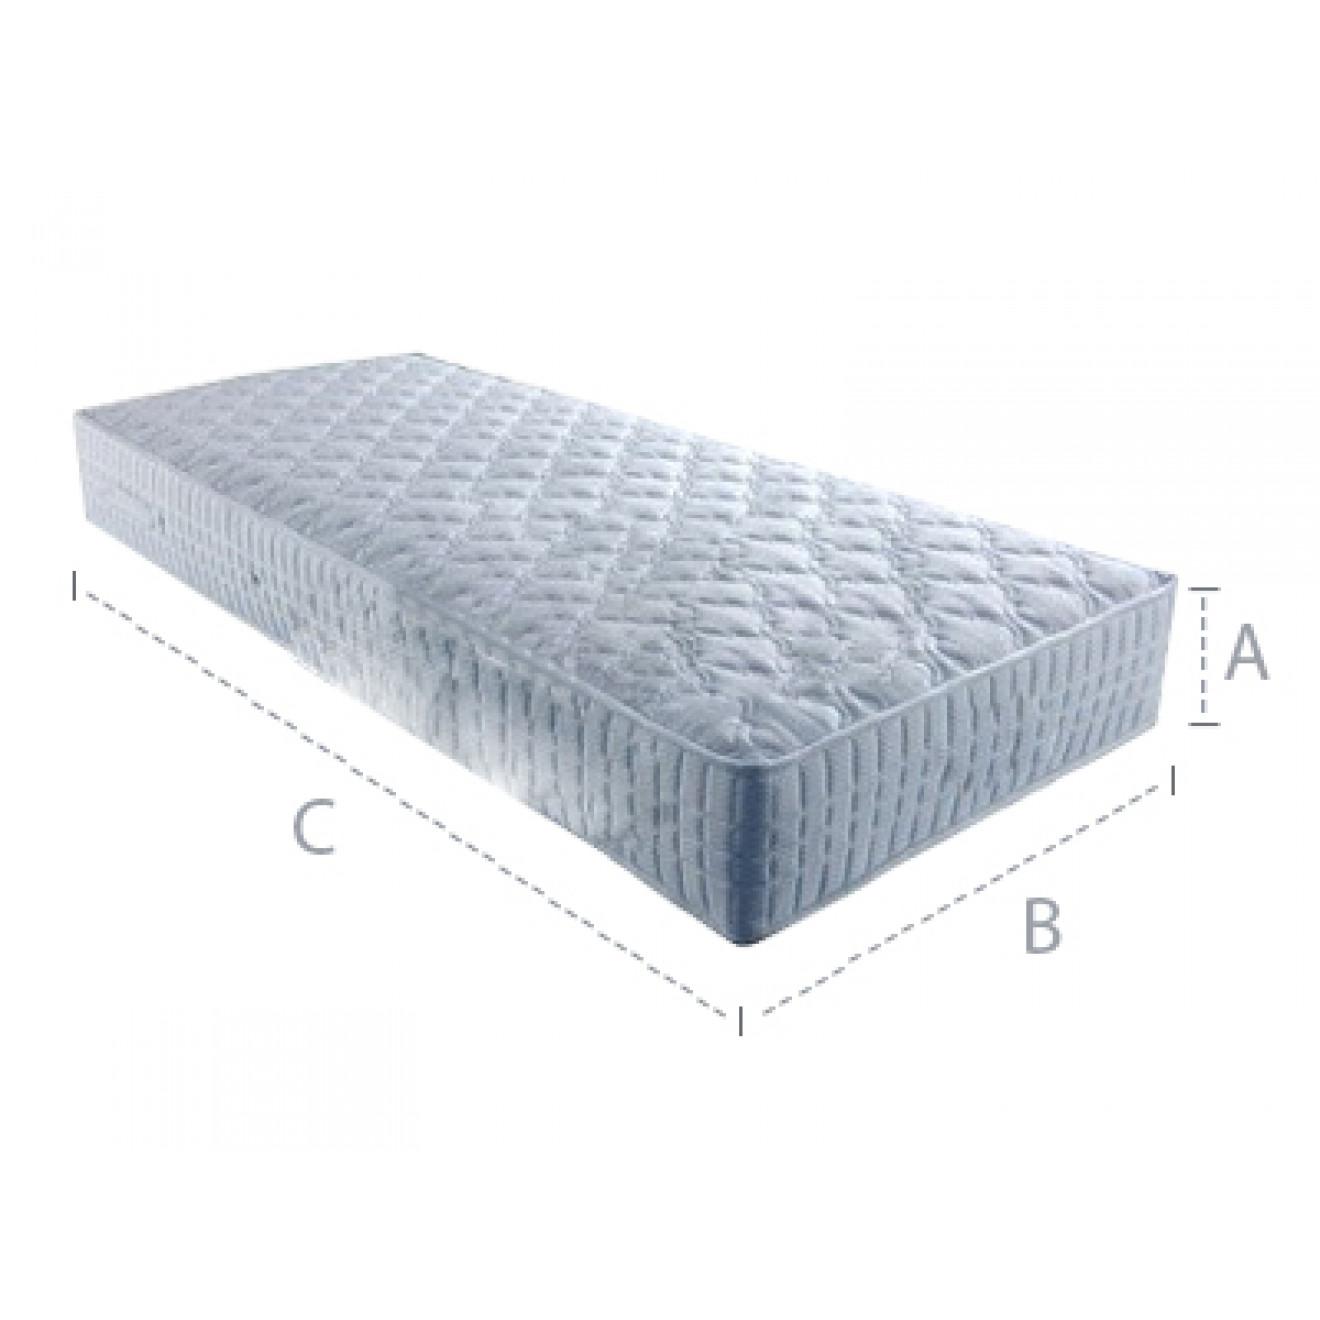 schaumstoff zuschnitt konfigurator. Black Bedroom Furniture Sets. Home Design Ideas